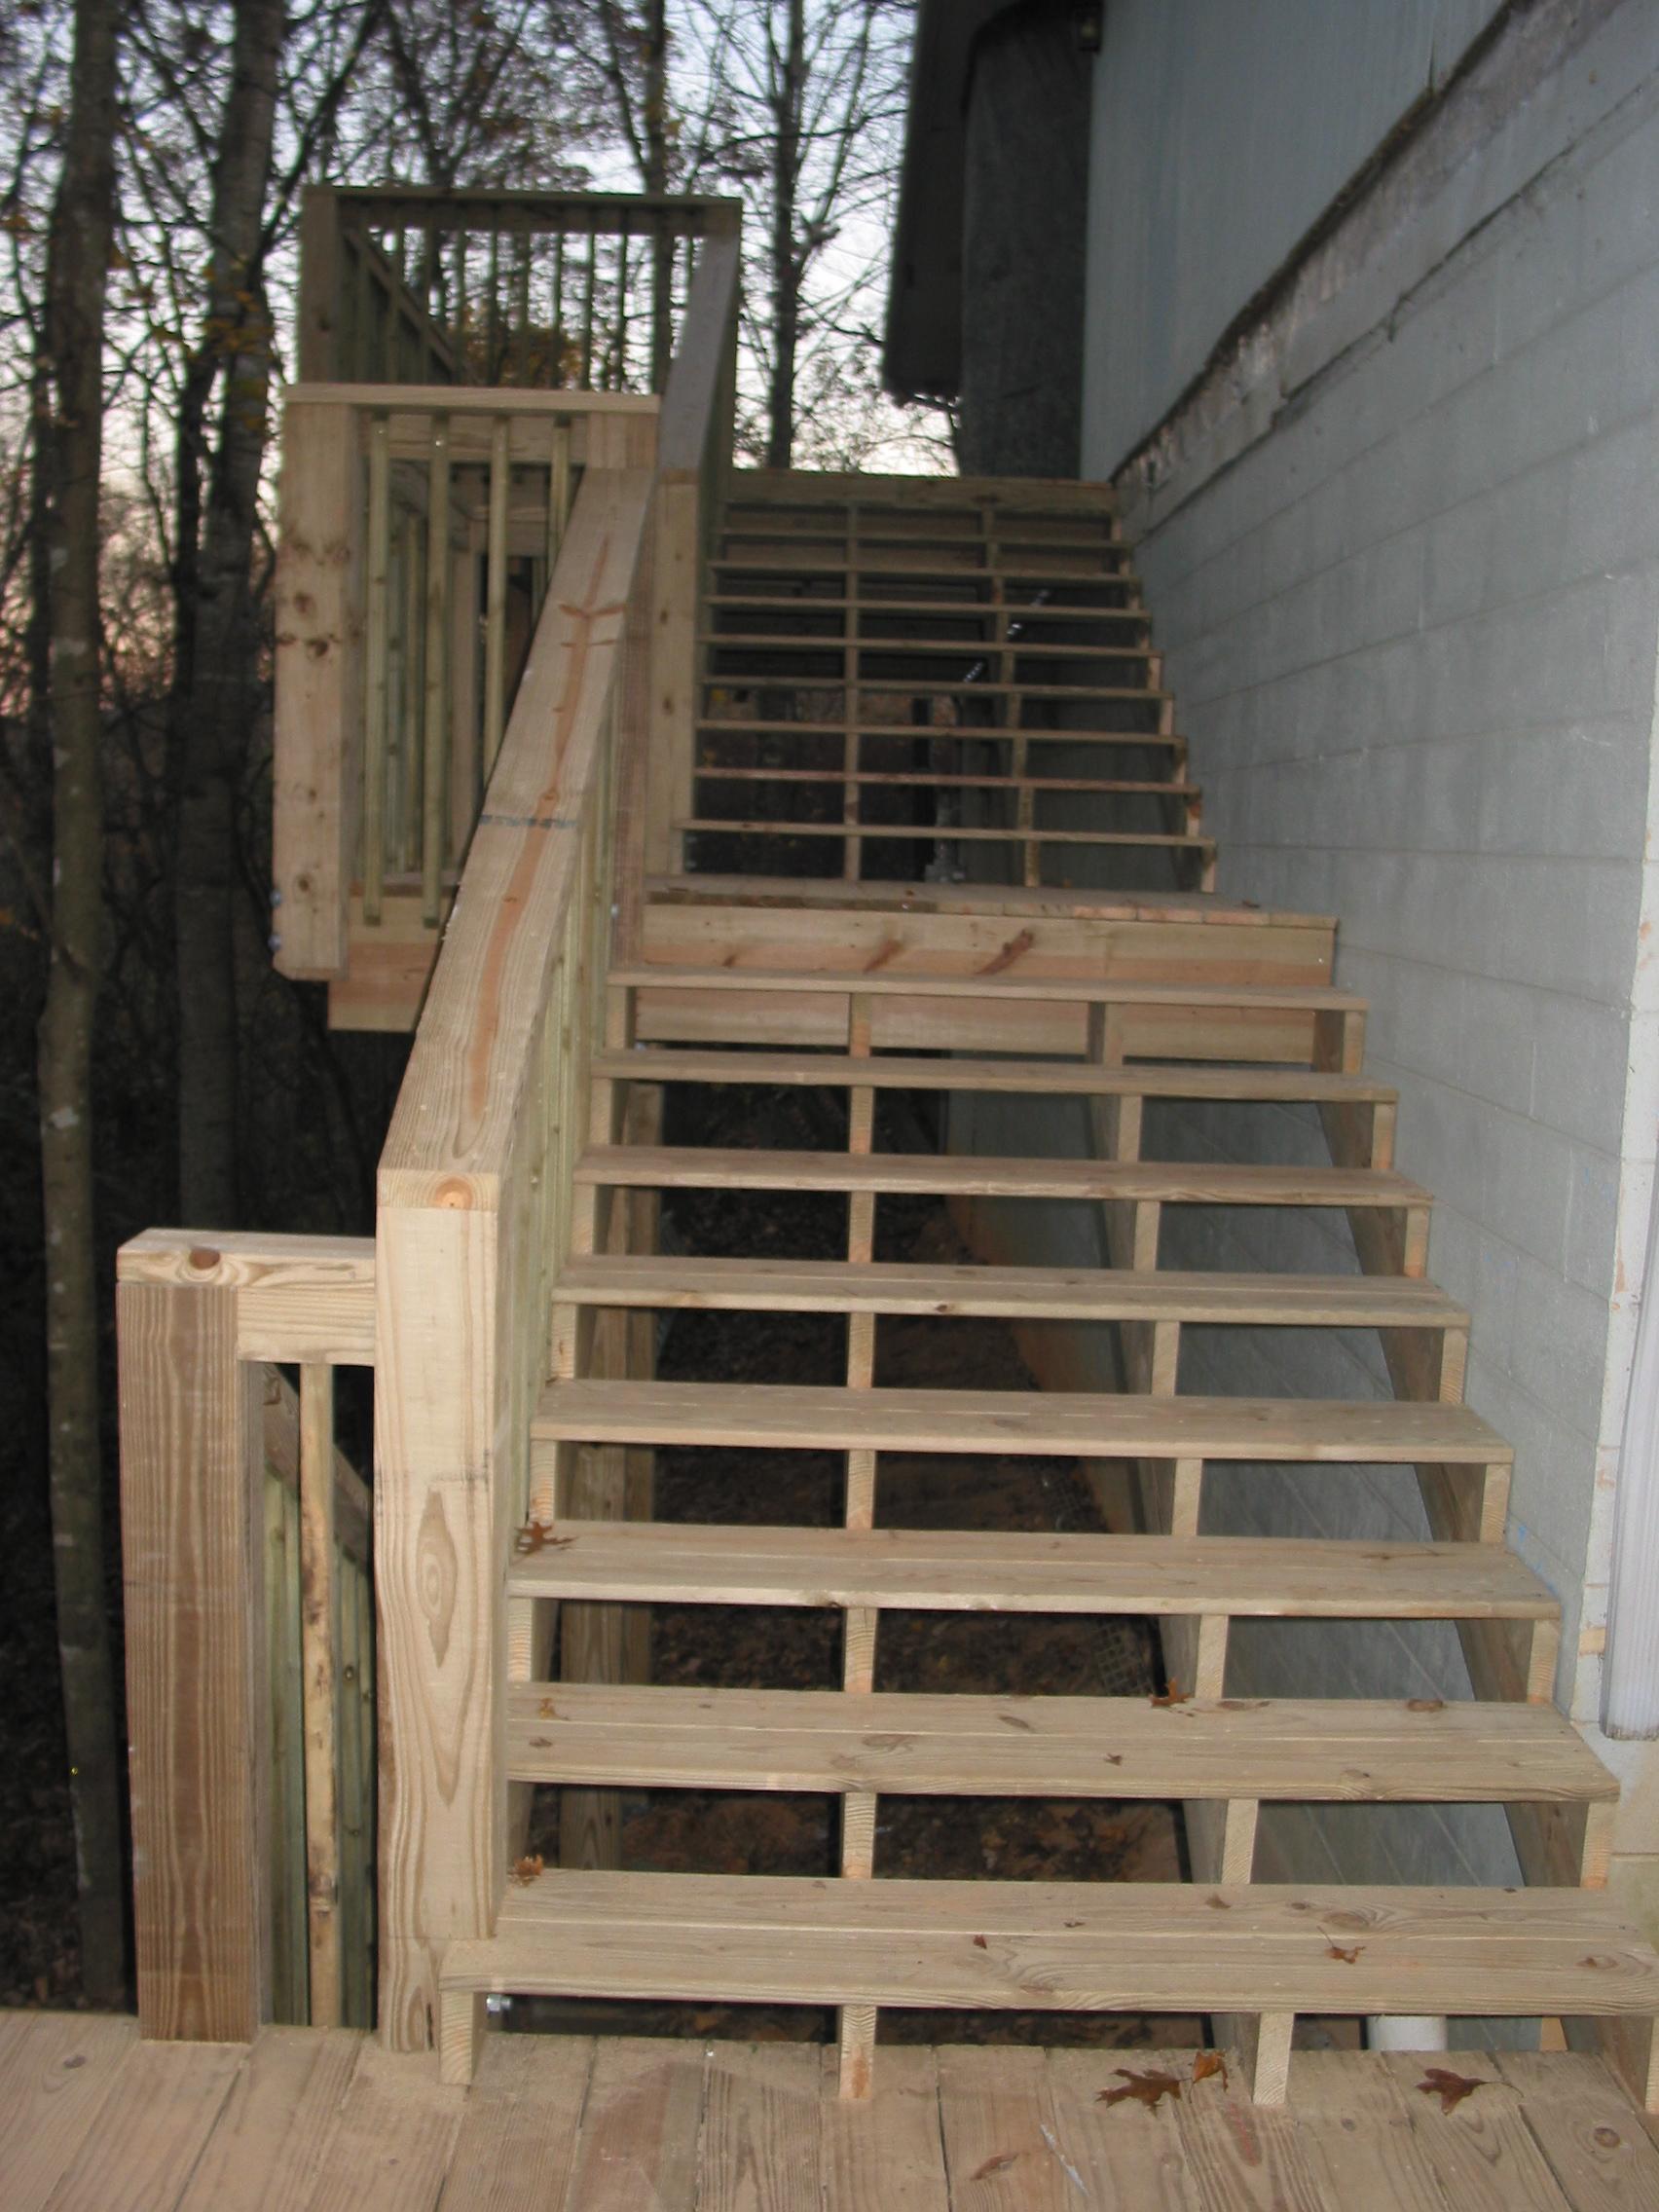 Olson Residence, Detail of multi-level stairway.